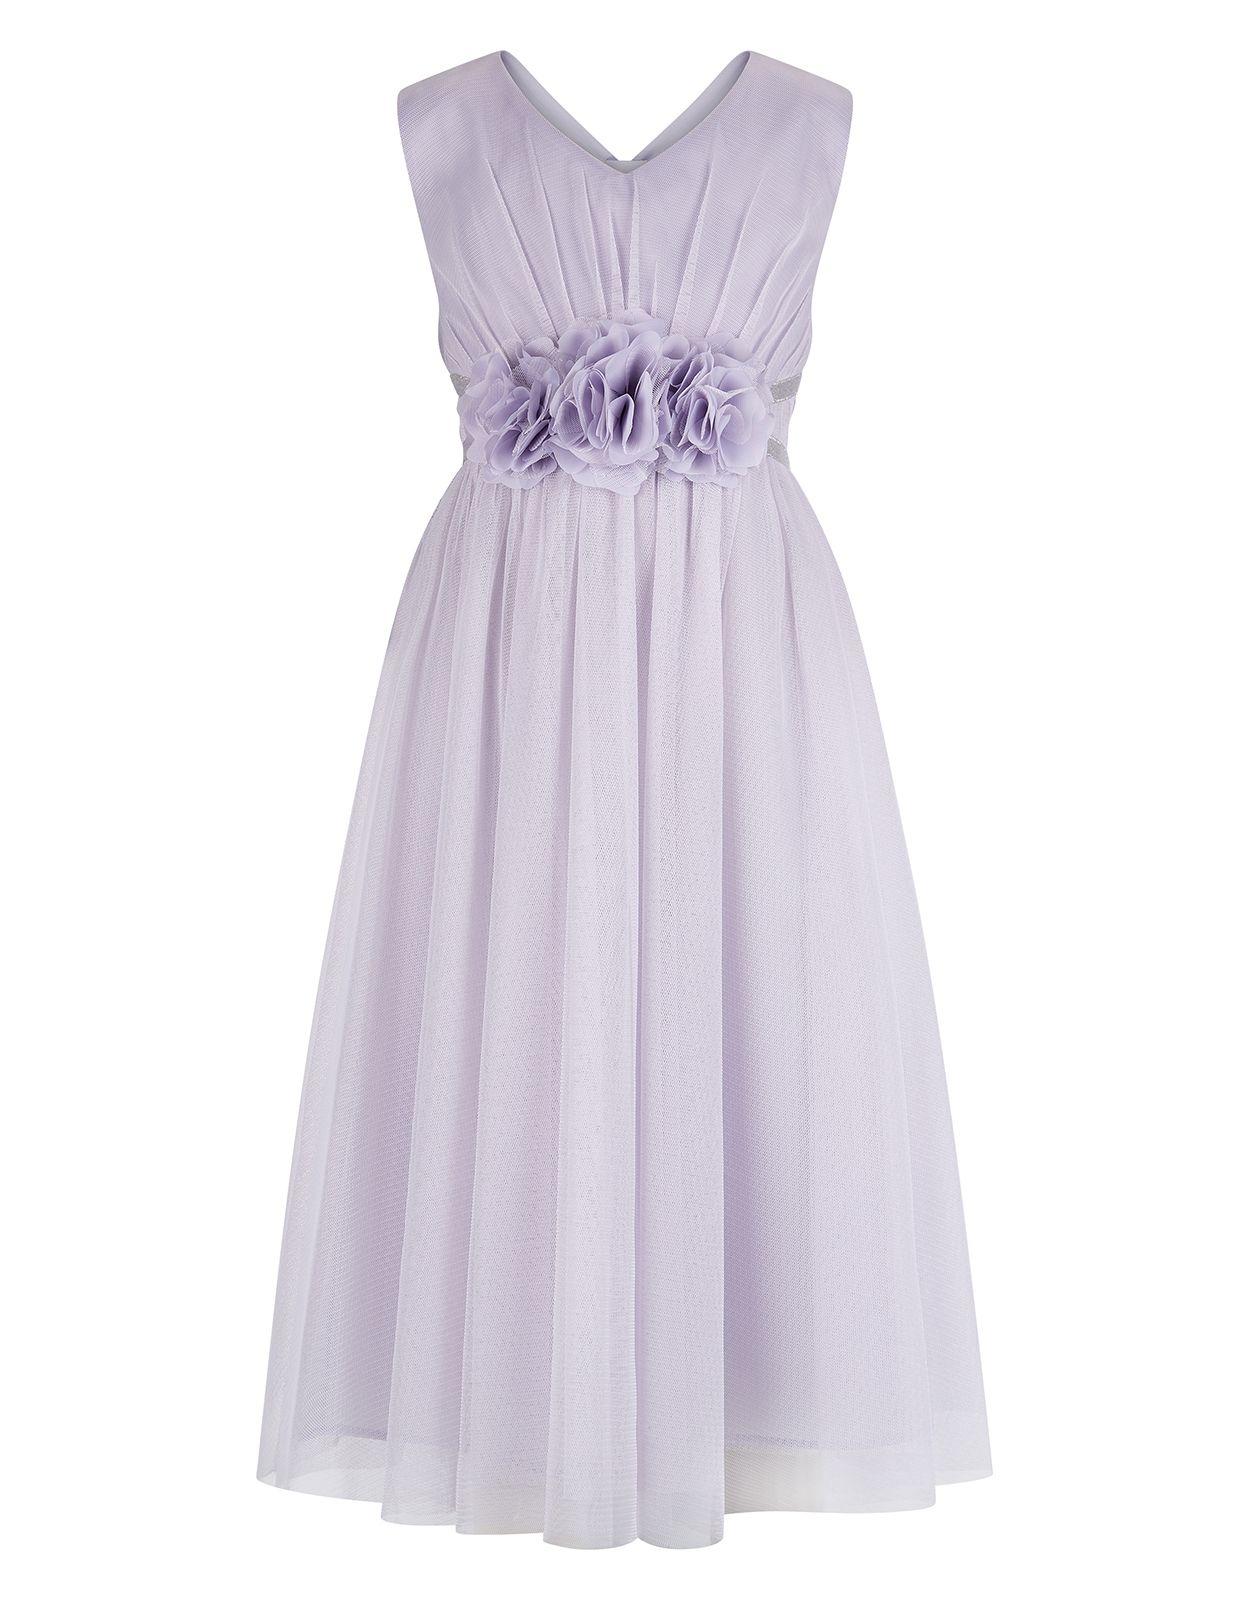 Sibbe dress purple monsoon marisa pinterest monsoon sibbe dress purple monsoon jr bridesmaid dressesjunior bridesmaidschildrens ombrellifo Gallery